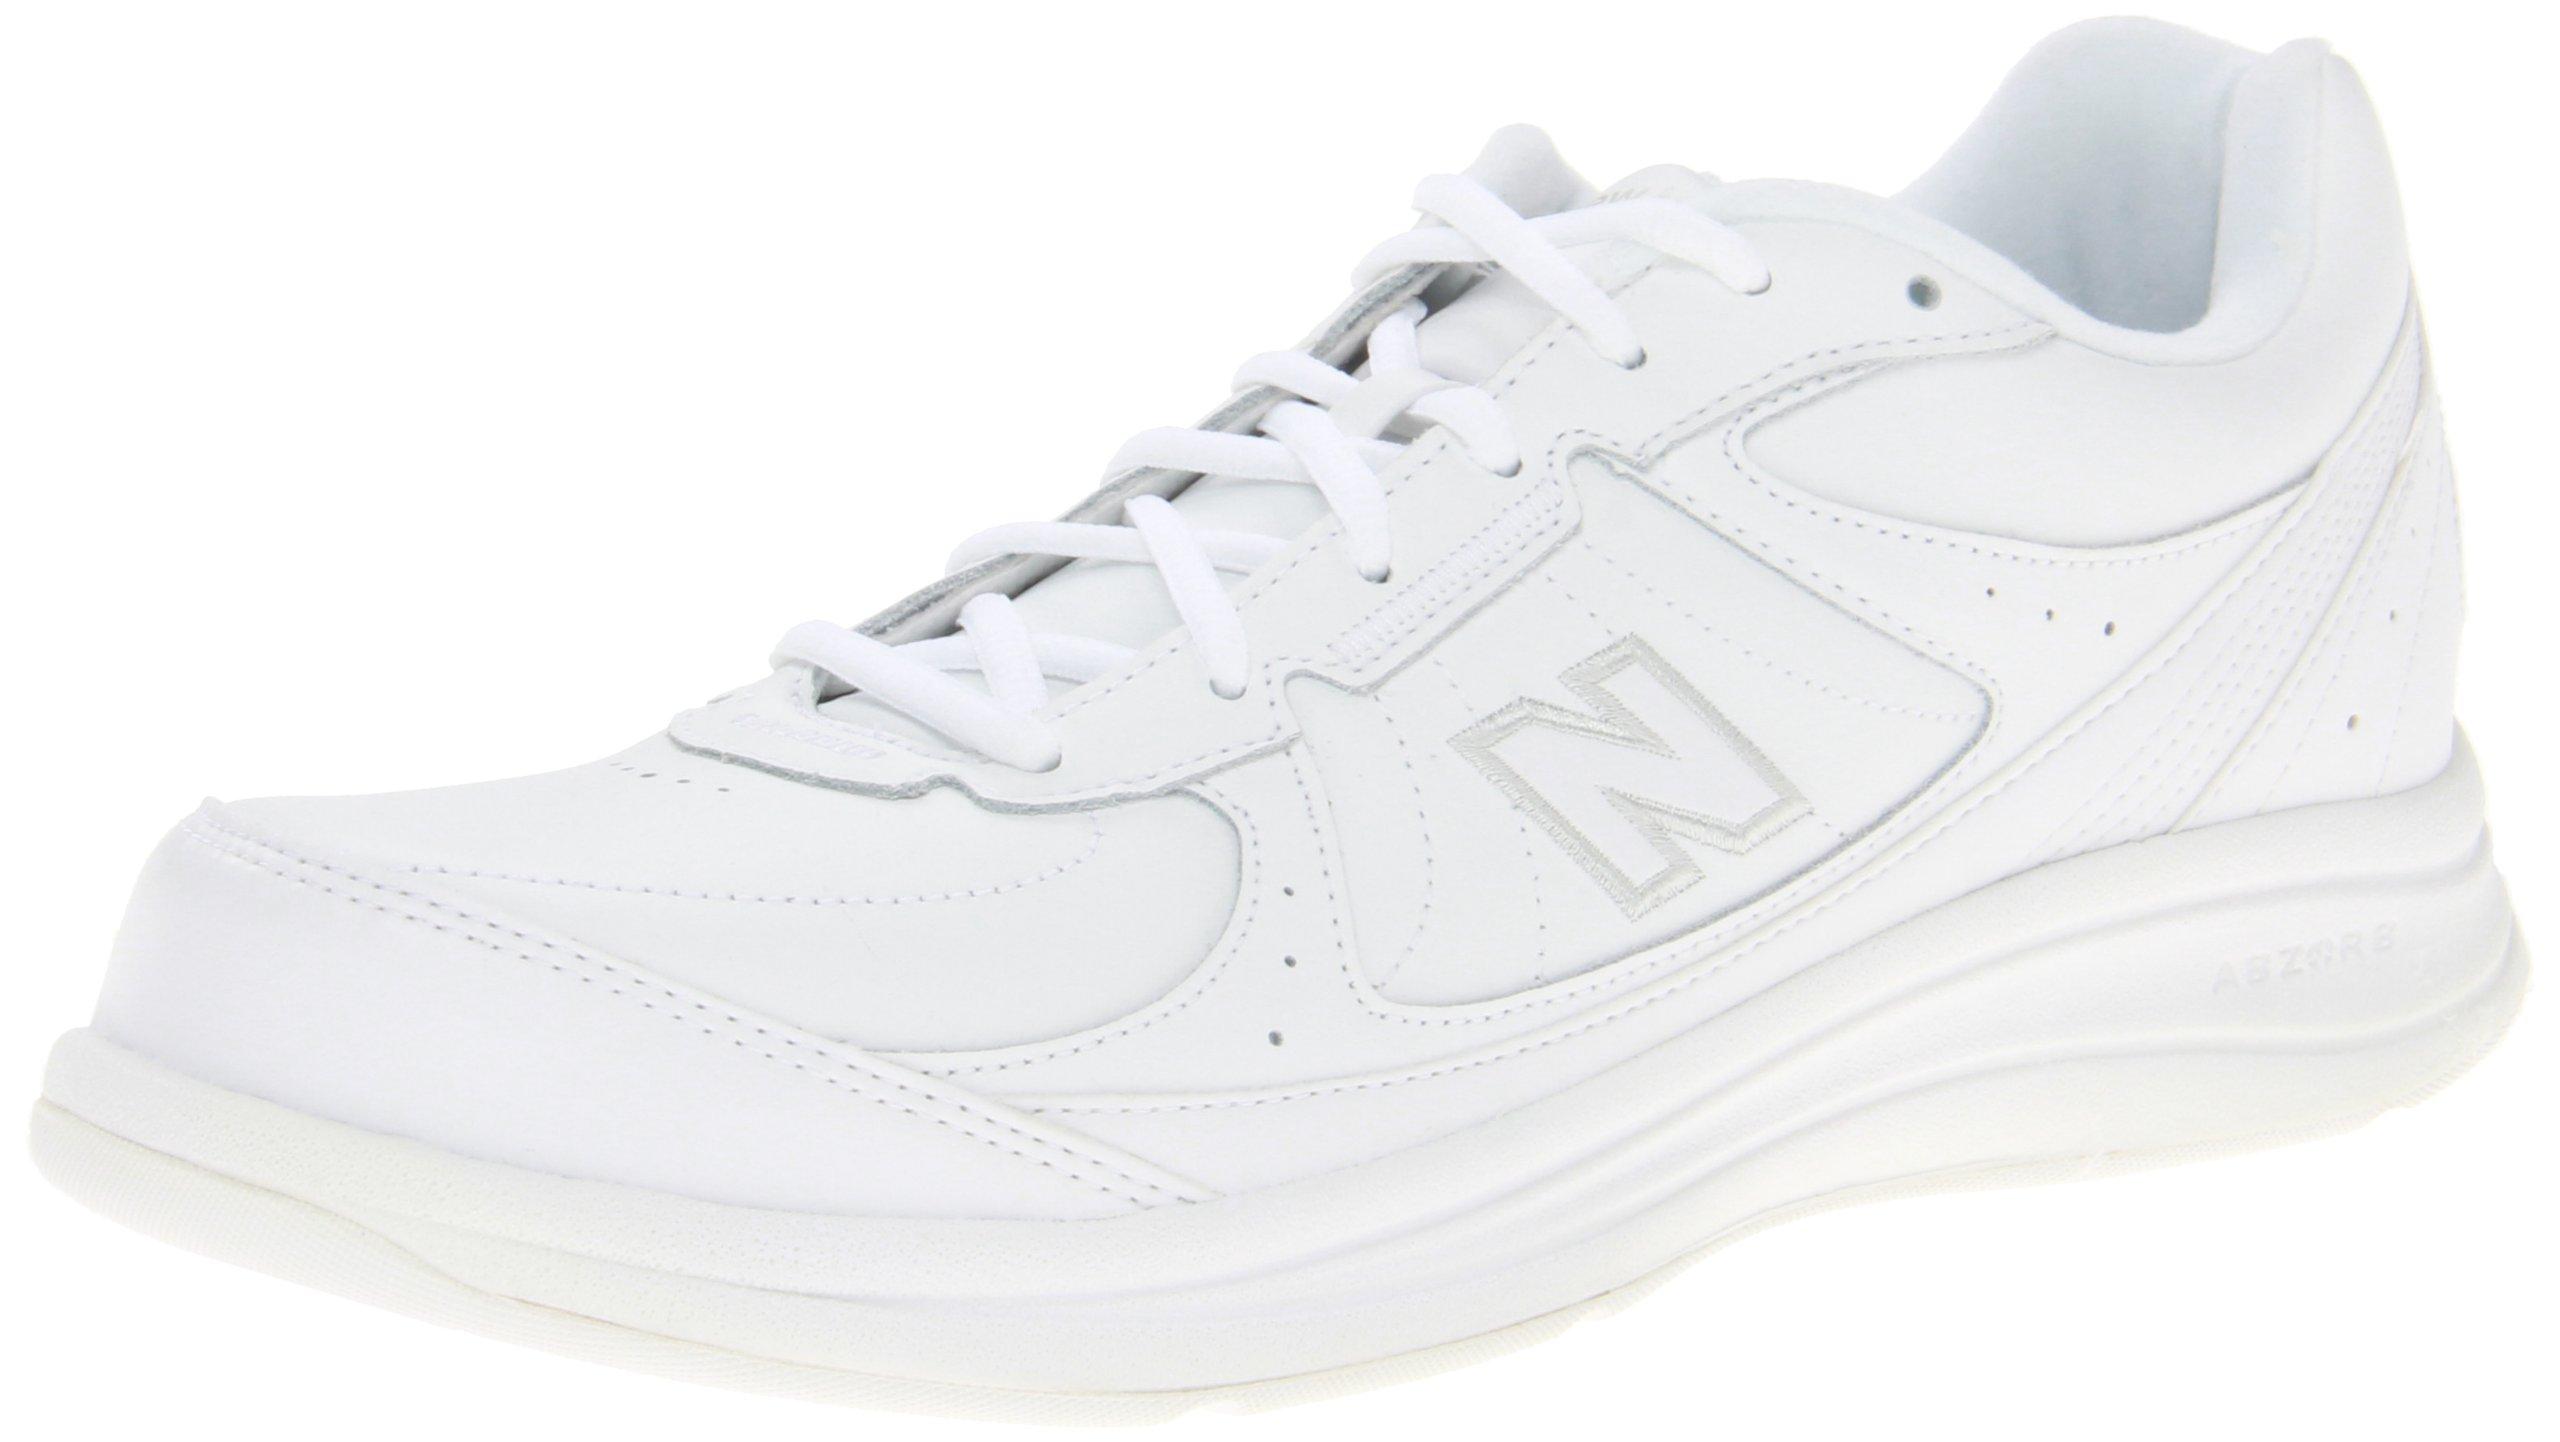 New Balance Men's MW577 White Walking Shoe - 14 4E US